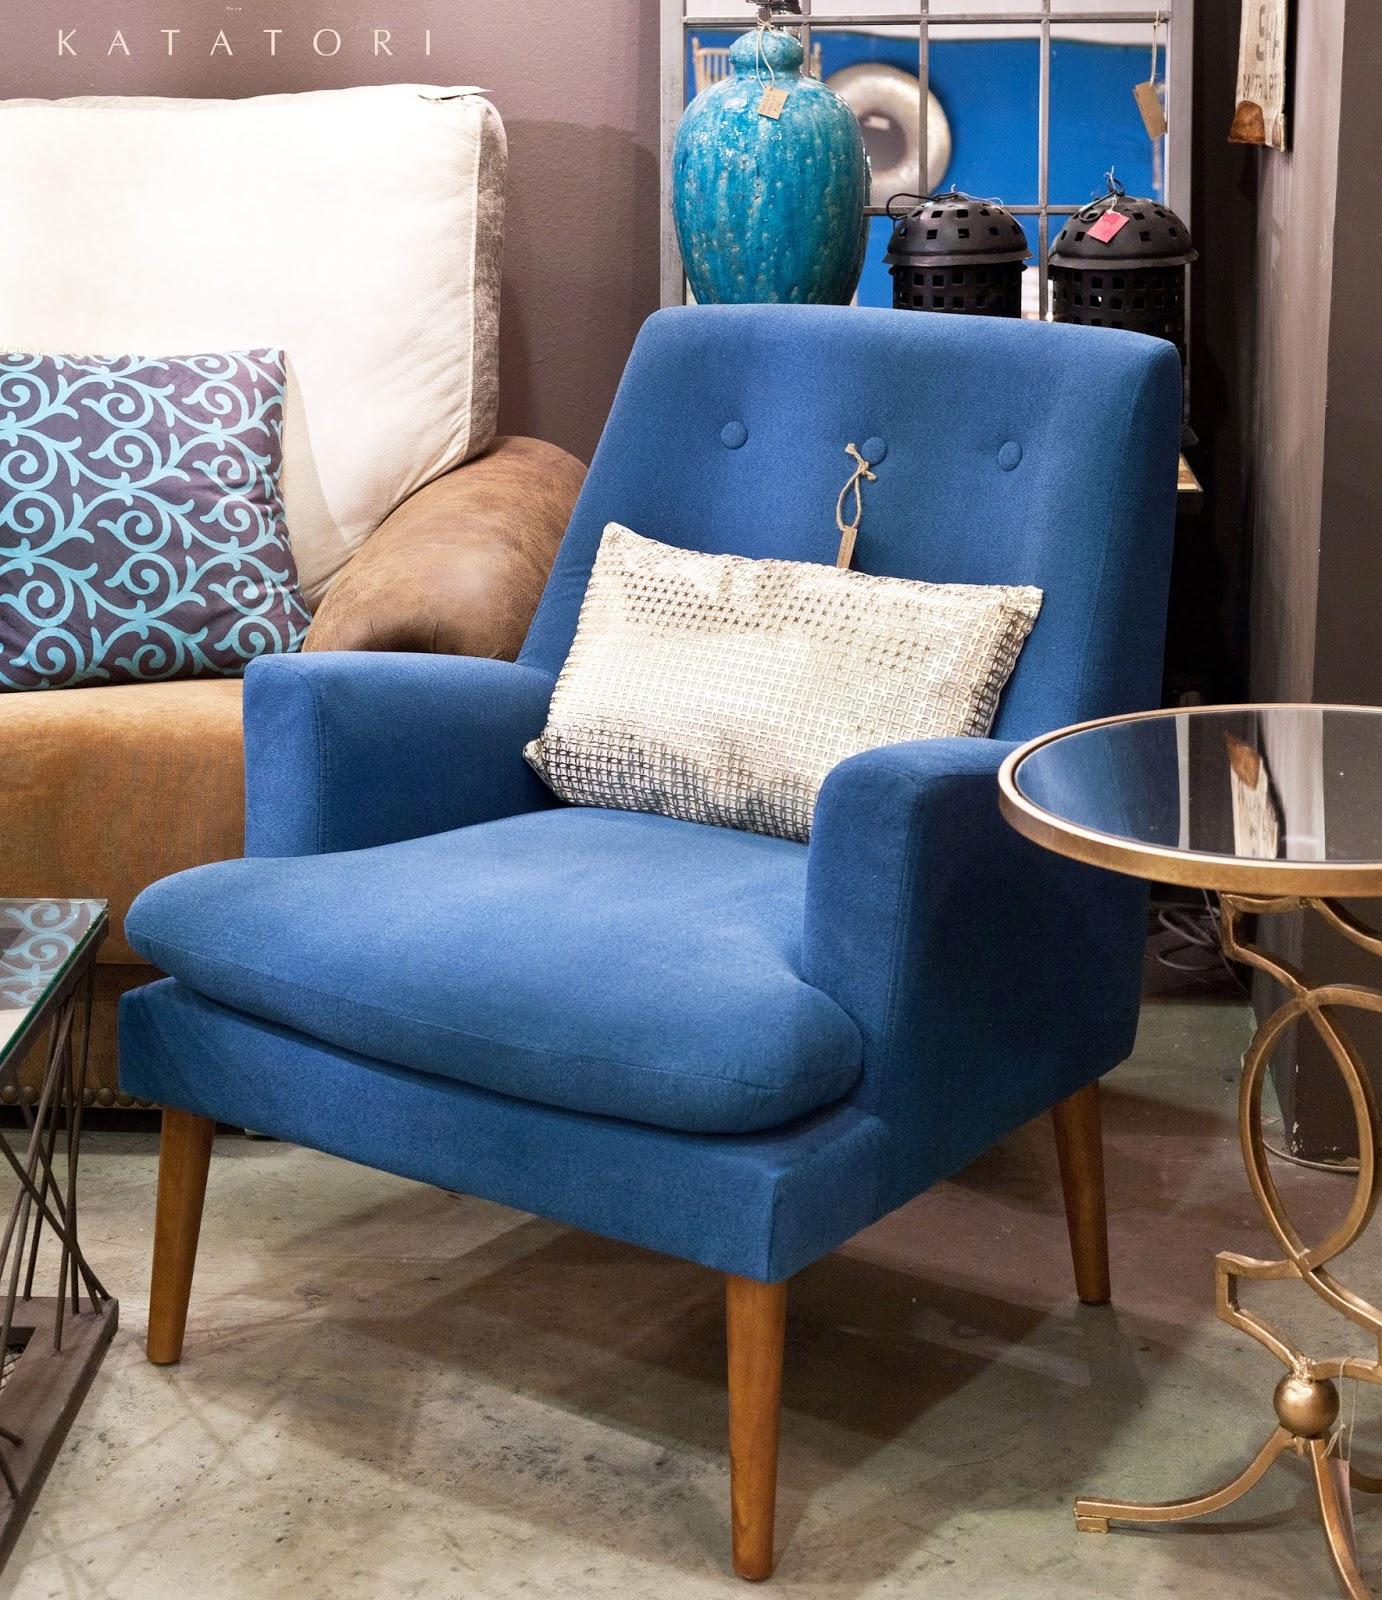 Katatori interiores azul for Muebles poligono el manchon